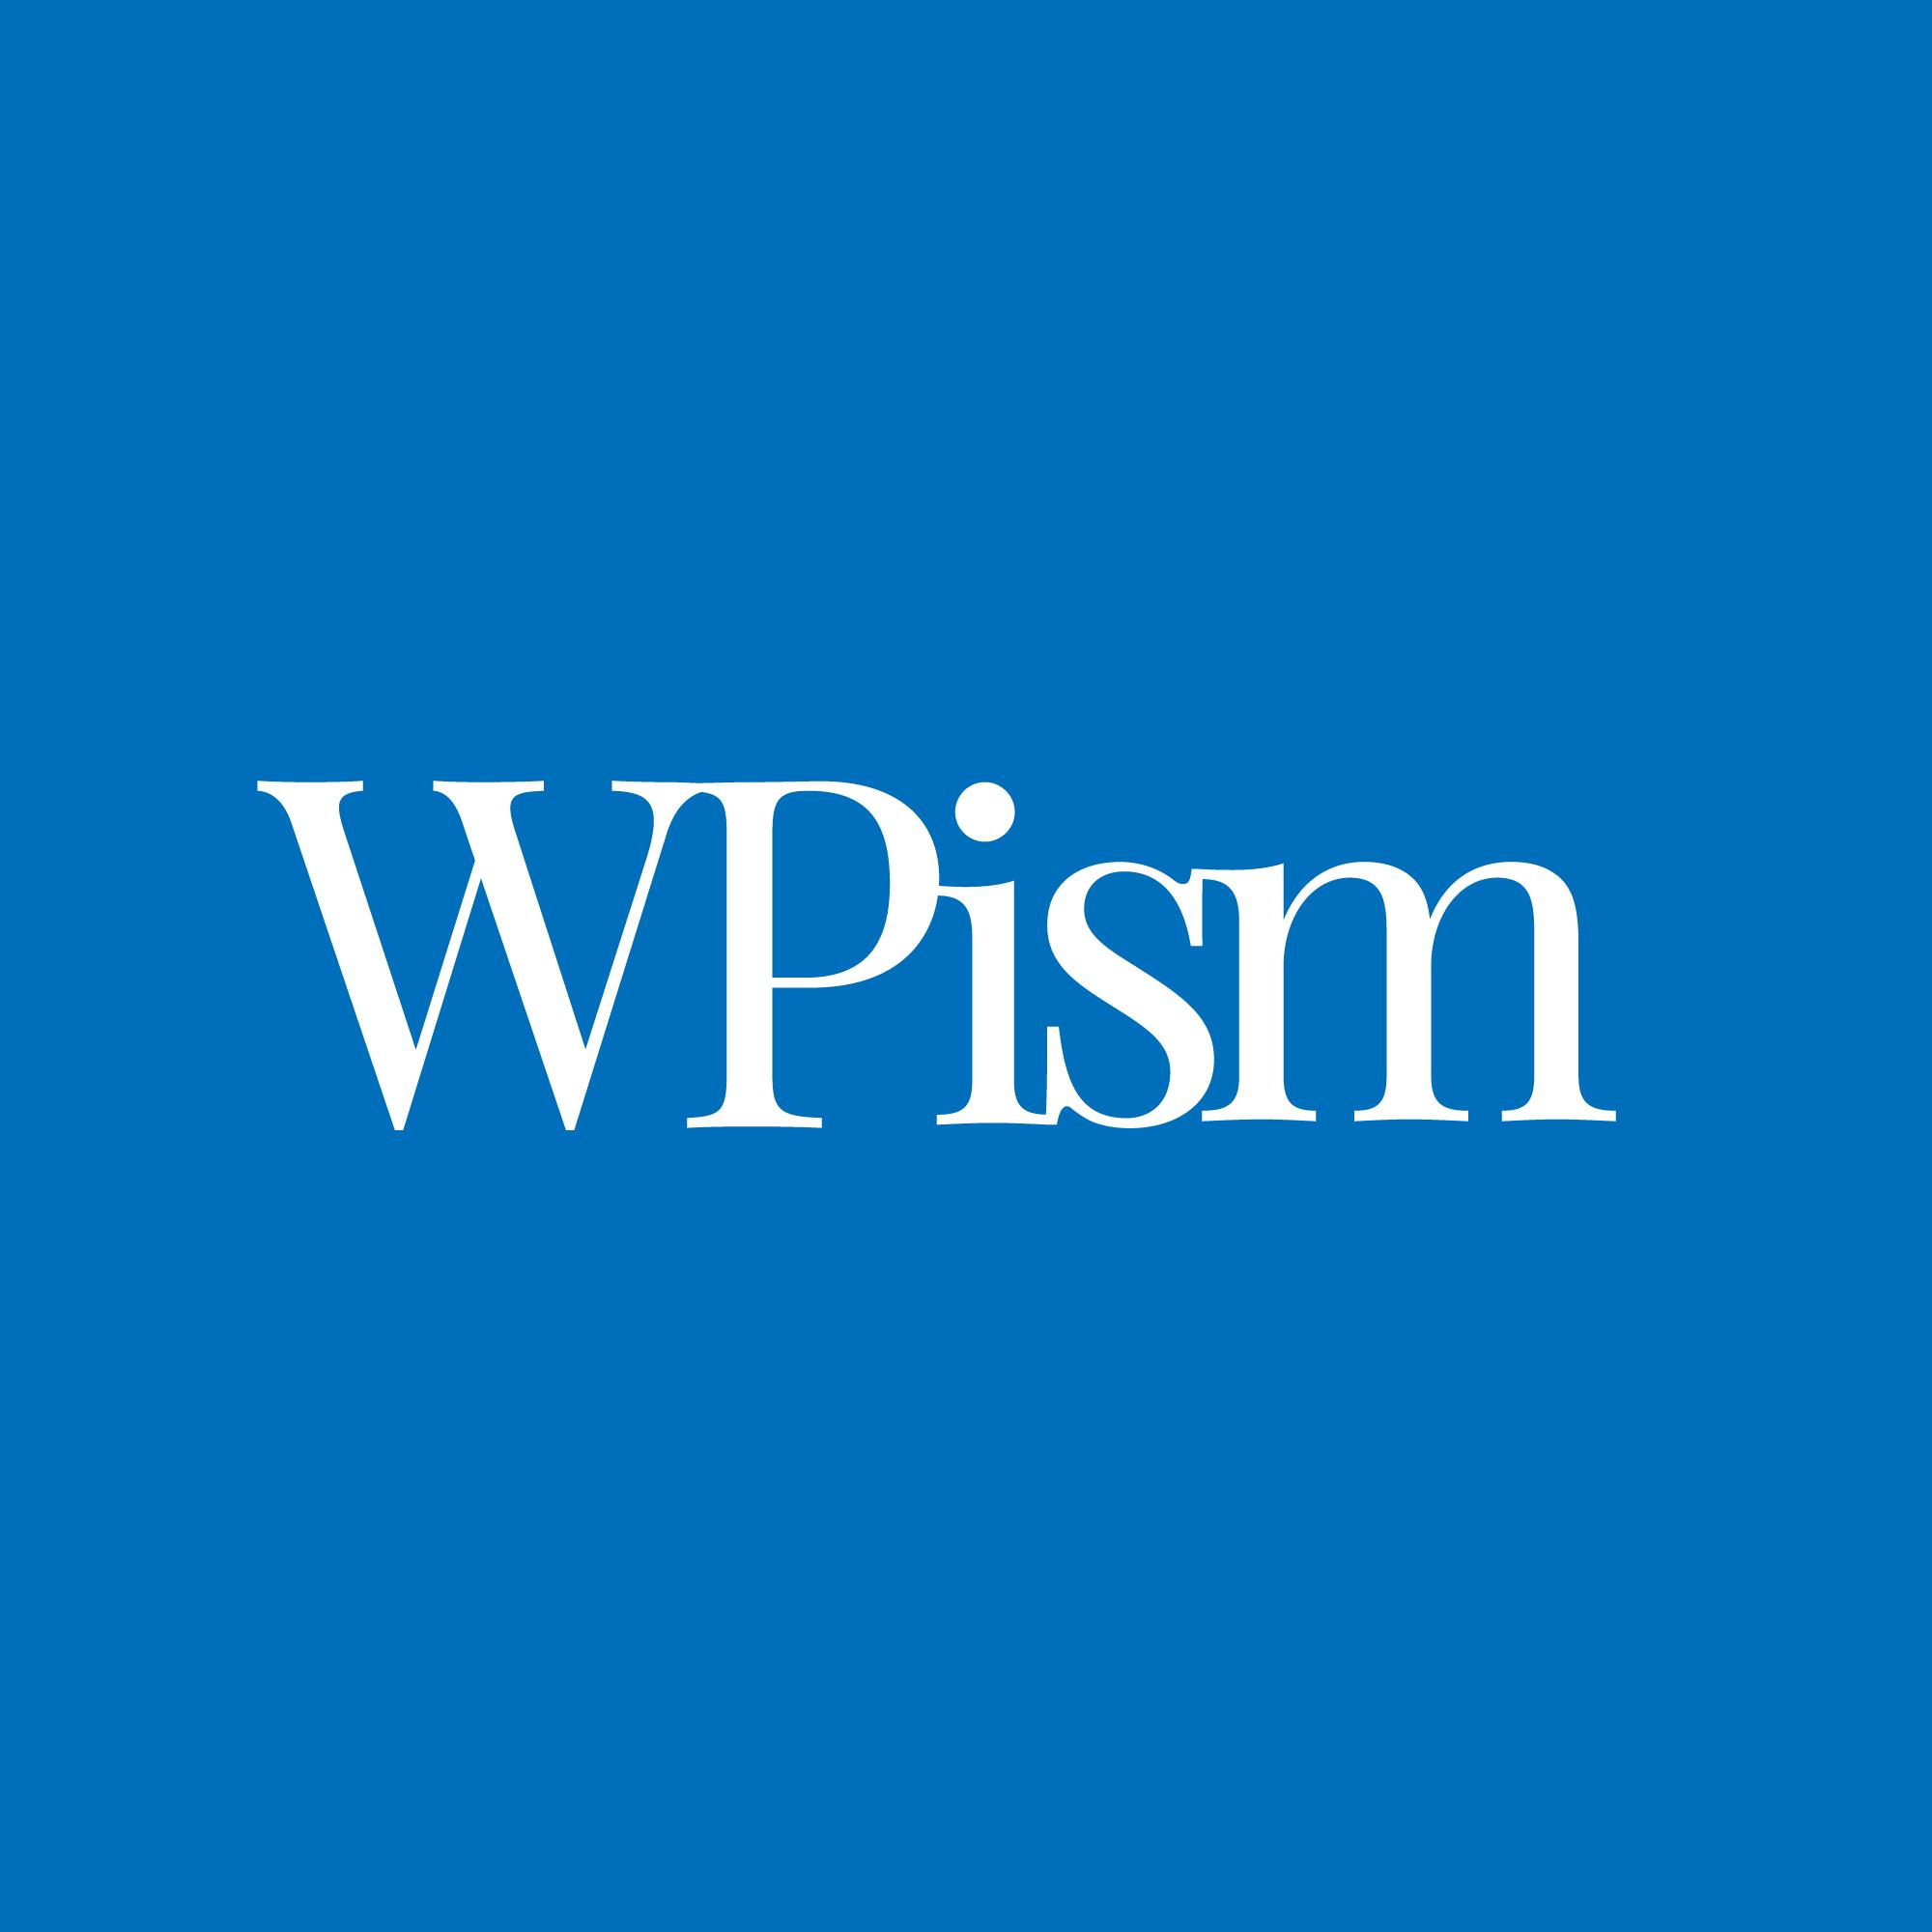 WPism-Square-Logo-Colour-Background